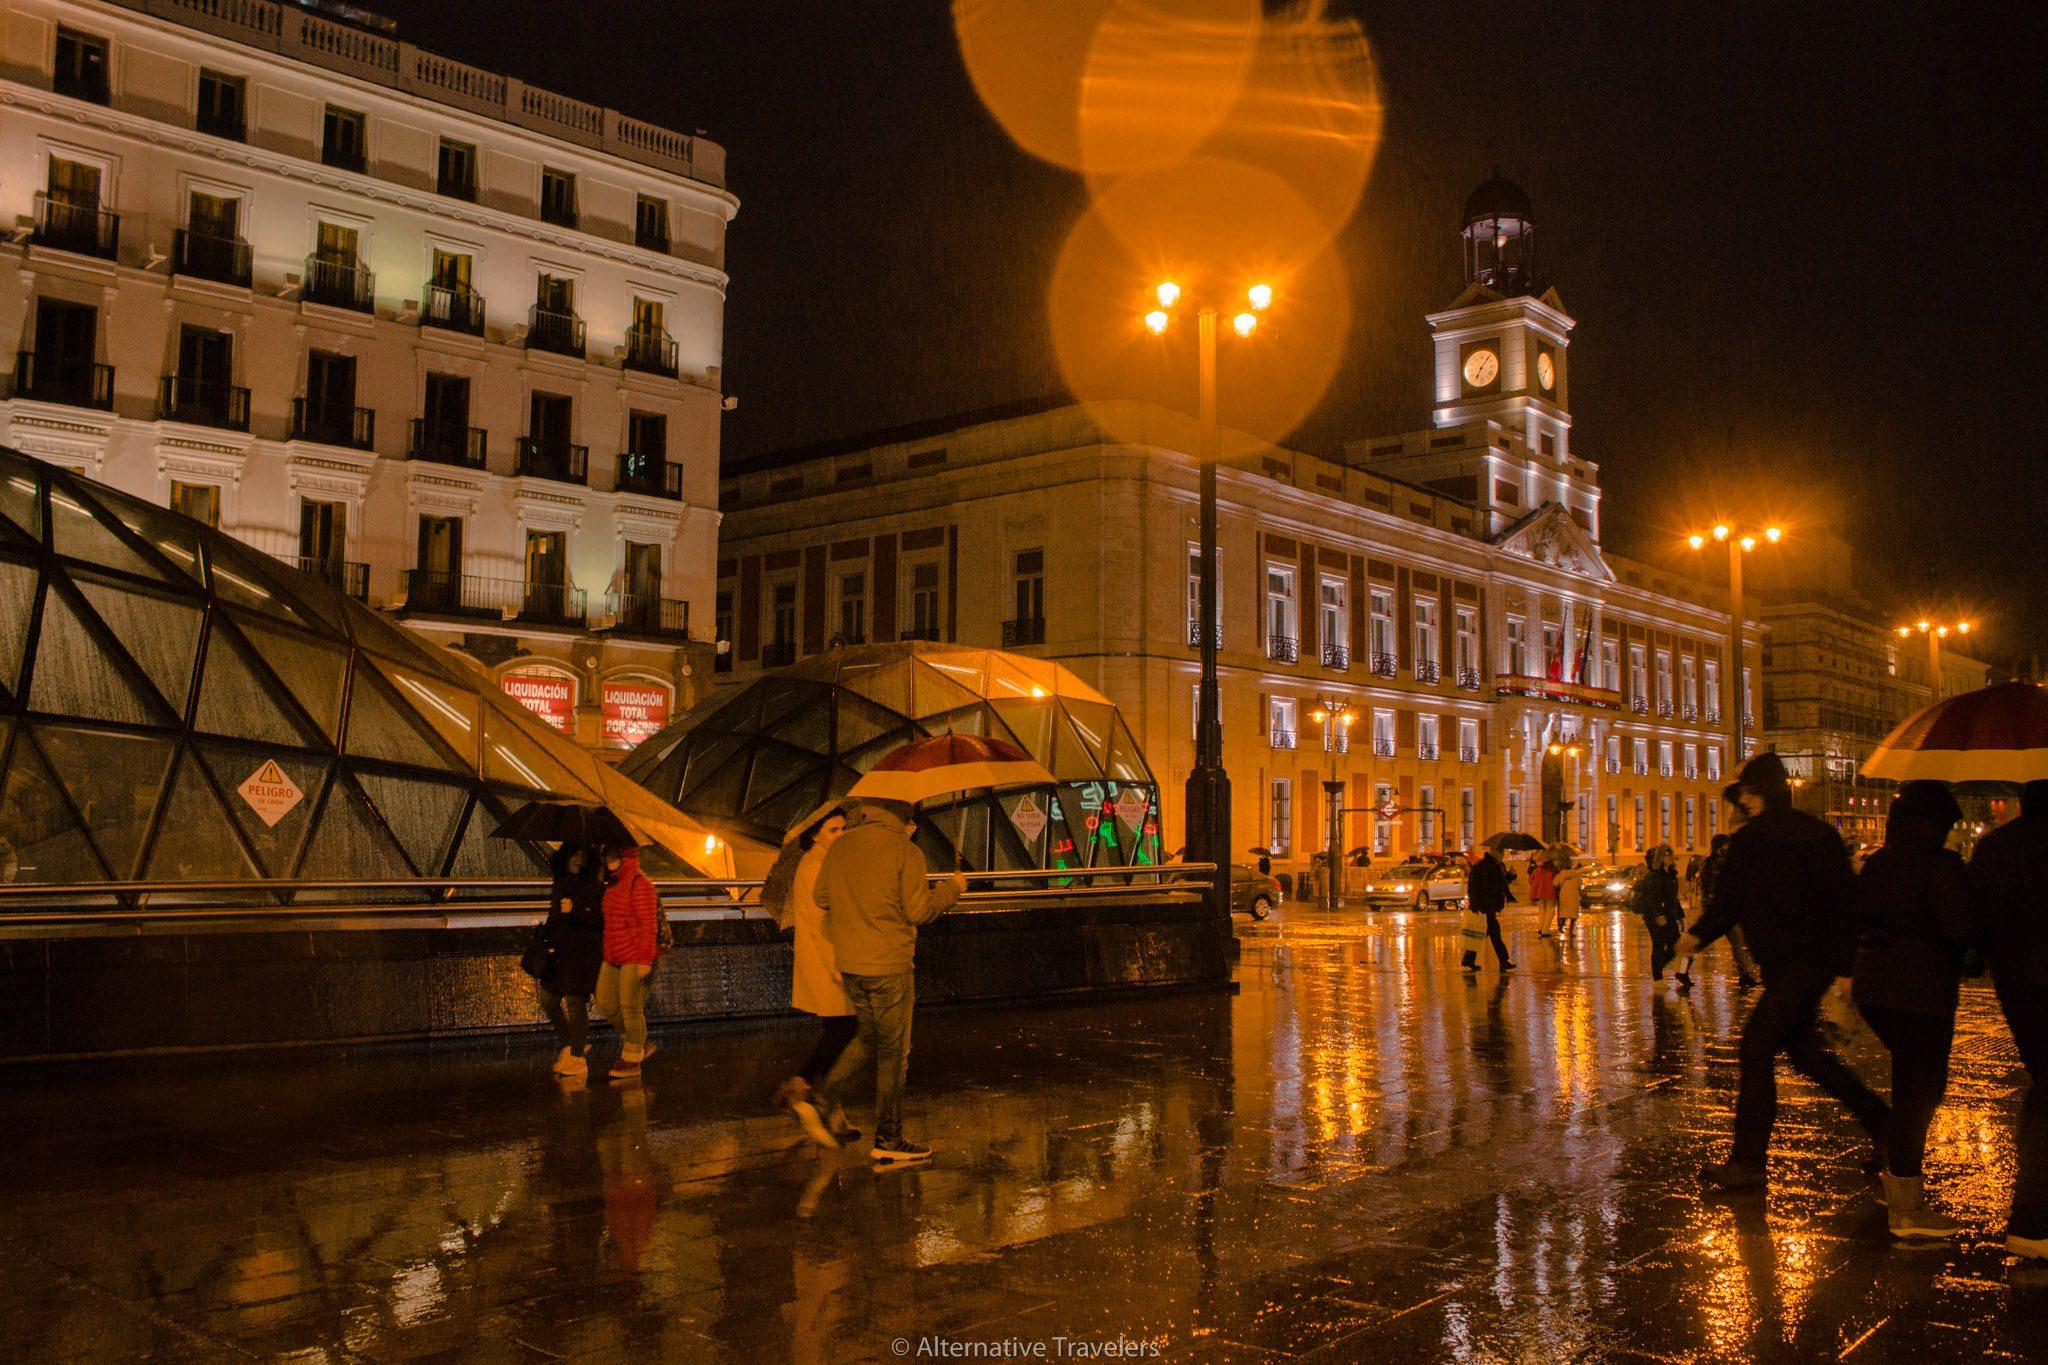 Puerta del Sol, Madrid in the dark